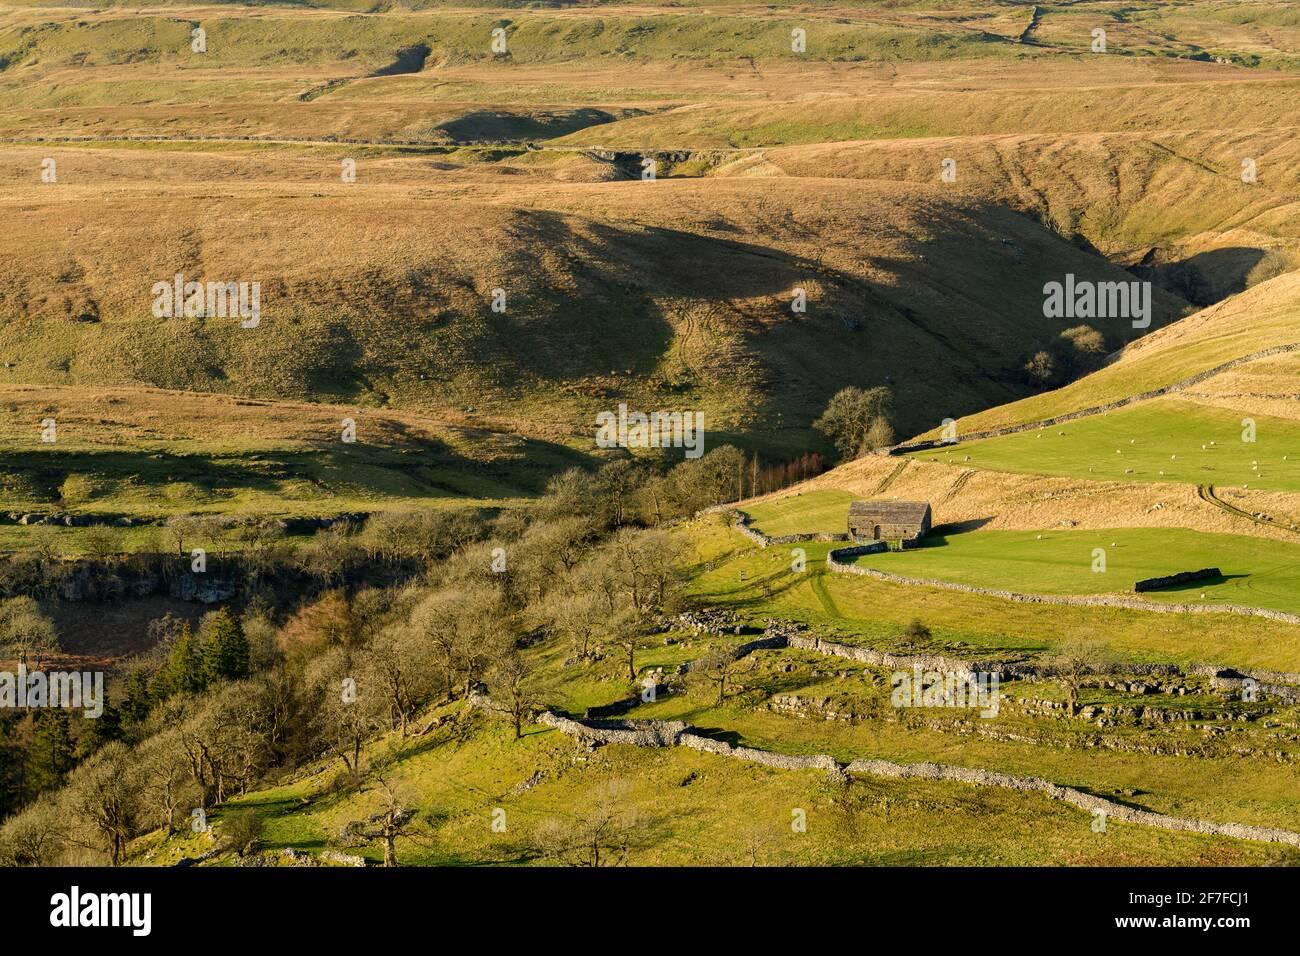 Scenic sunny Wharfedale landscape (upland fells, stone barn, steep hillside, limestone walls, sheep grazing pastures) - Yorkshire Dales, England, UK. Stock Photo